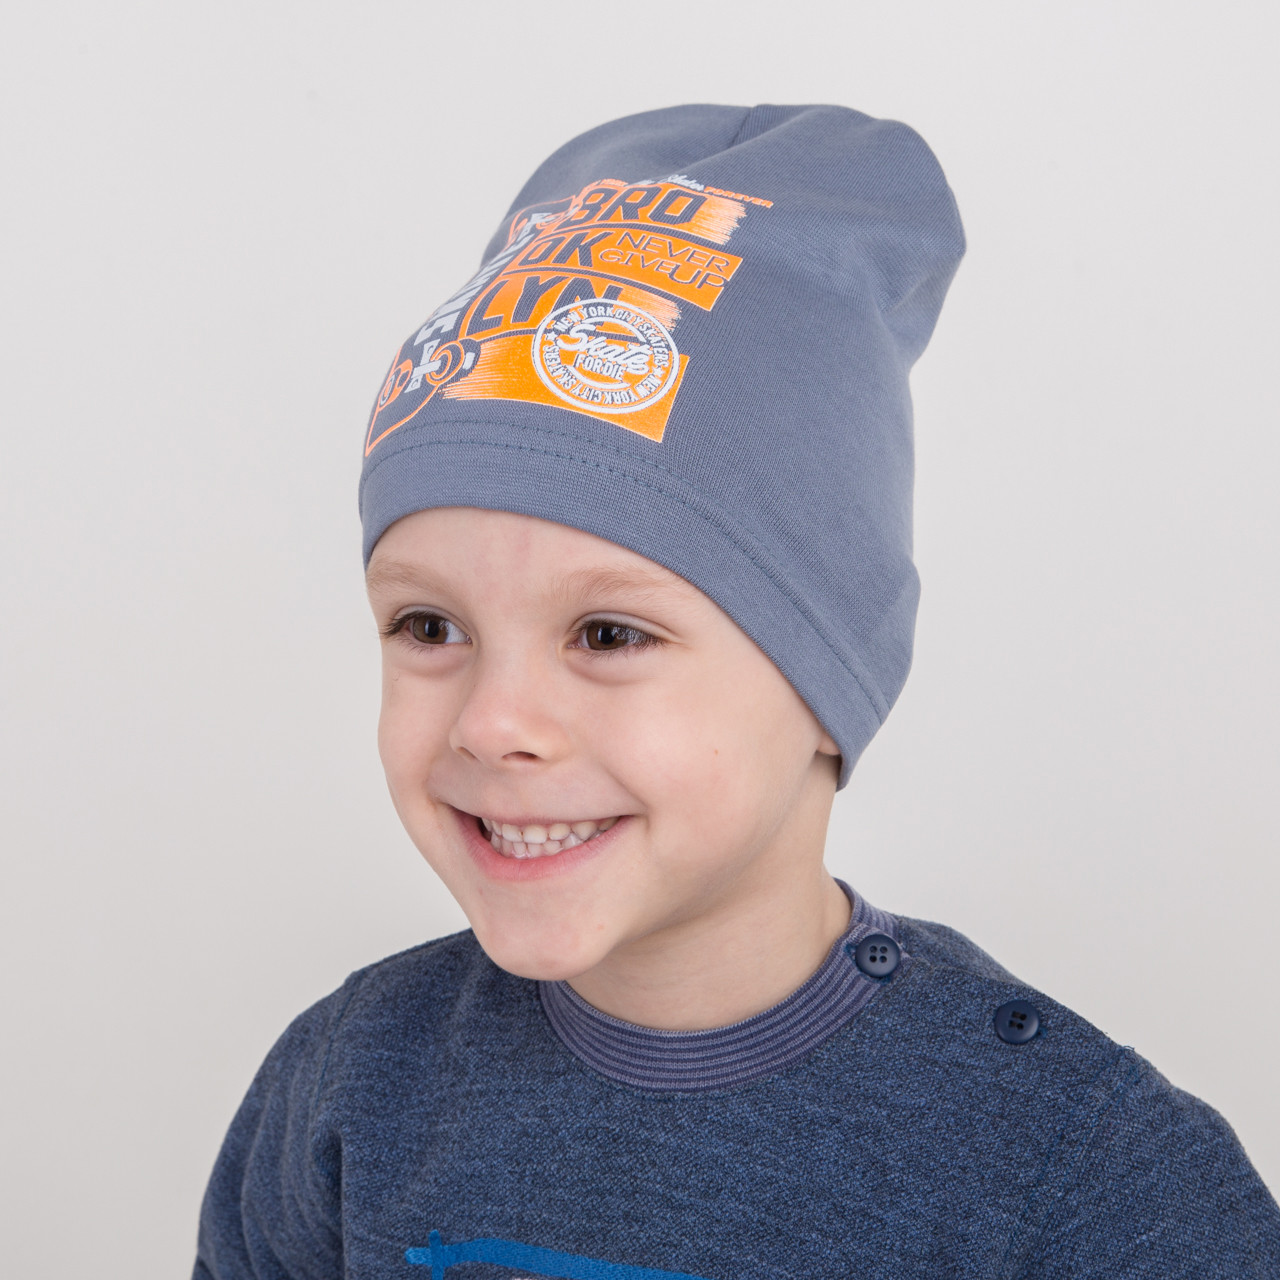 Хлопковая шапка на мальчика сезона весна 2018 оптом - Bro - Артикул 2196